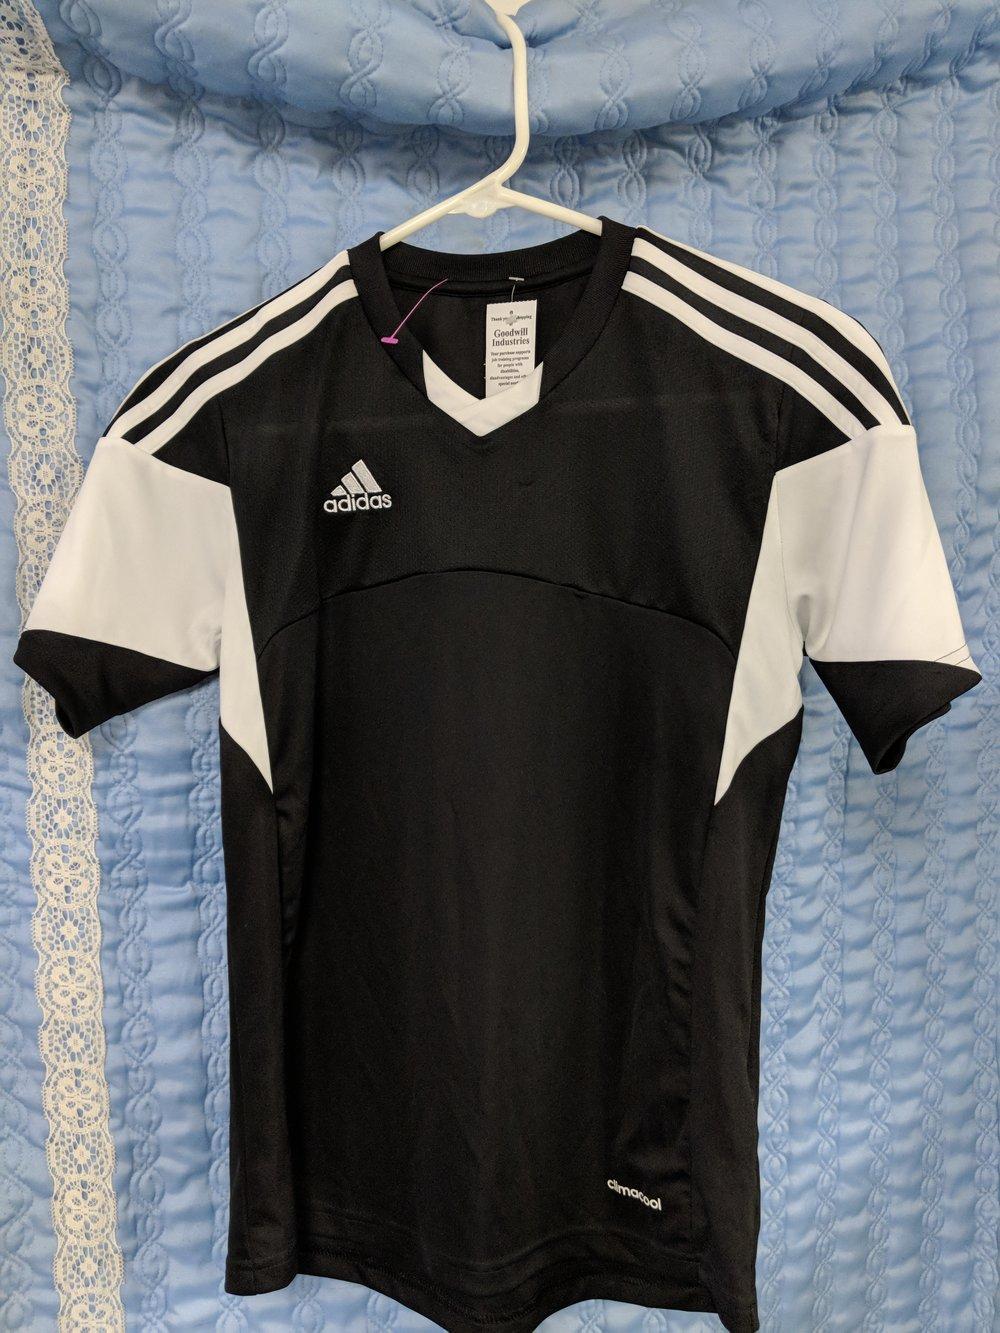 sports shirt.jpg